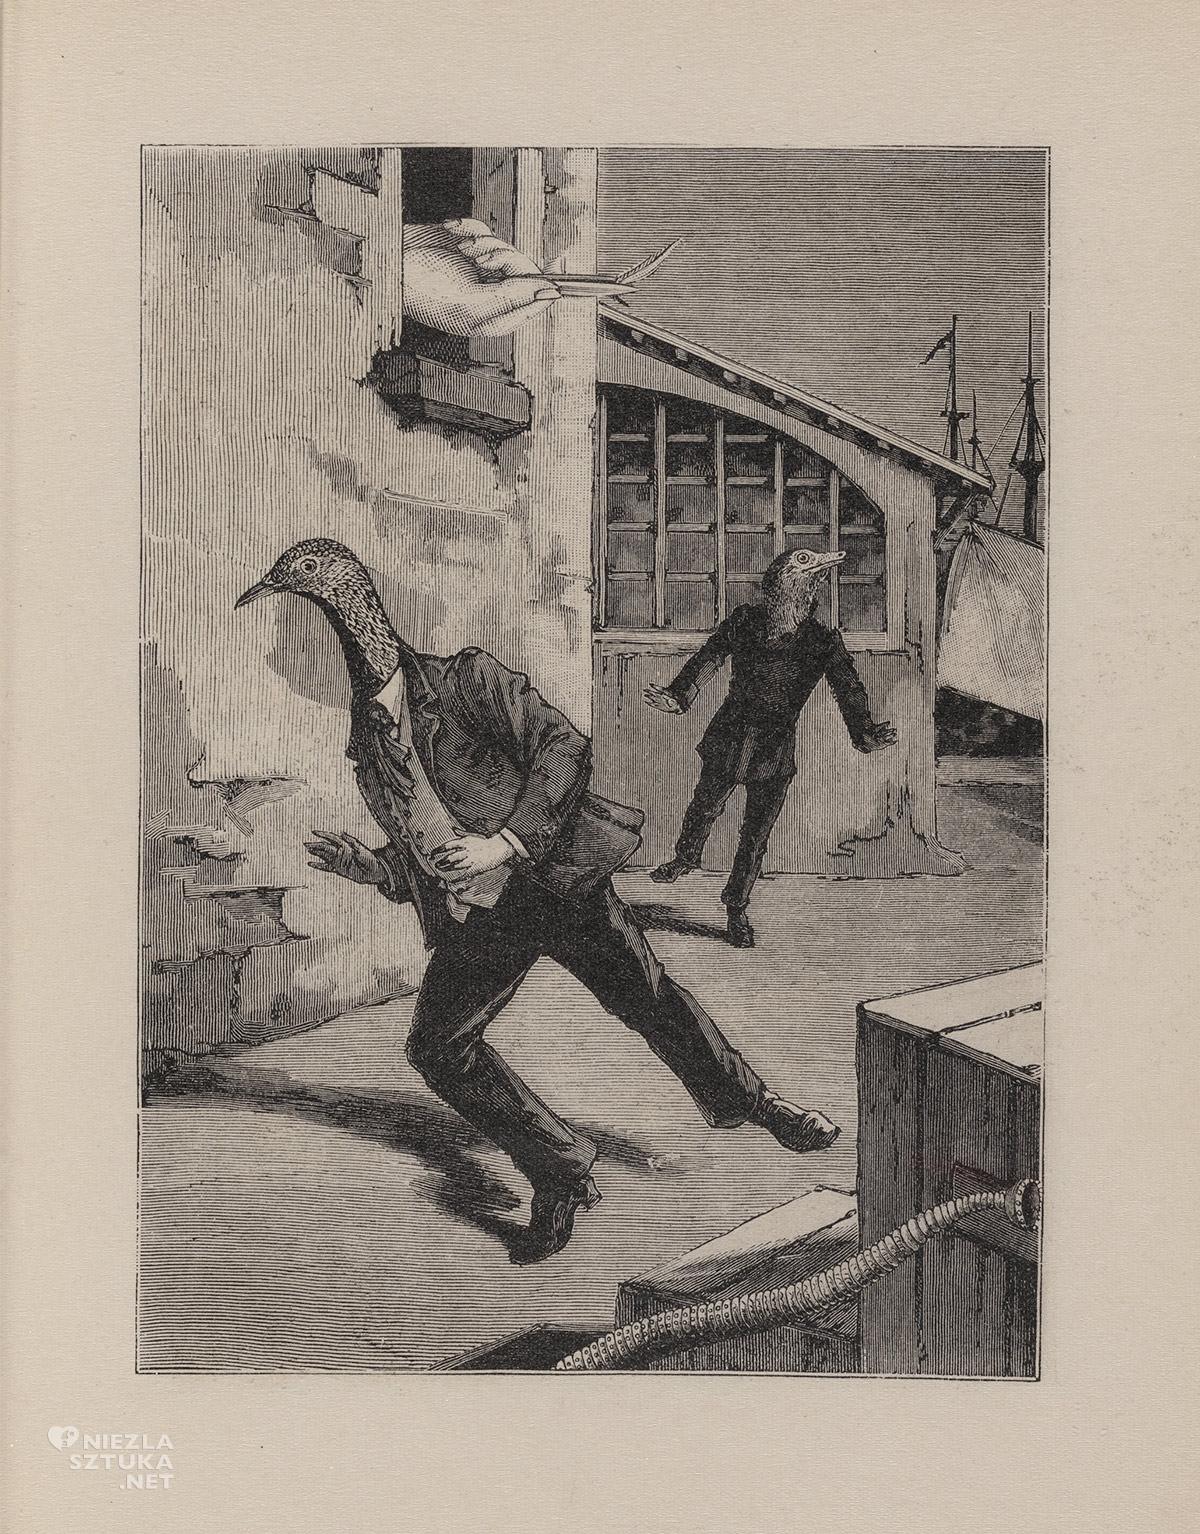 Max Ernst, surrealizm, dadaizm, Edyp, Niezła Sztuk